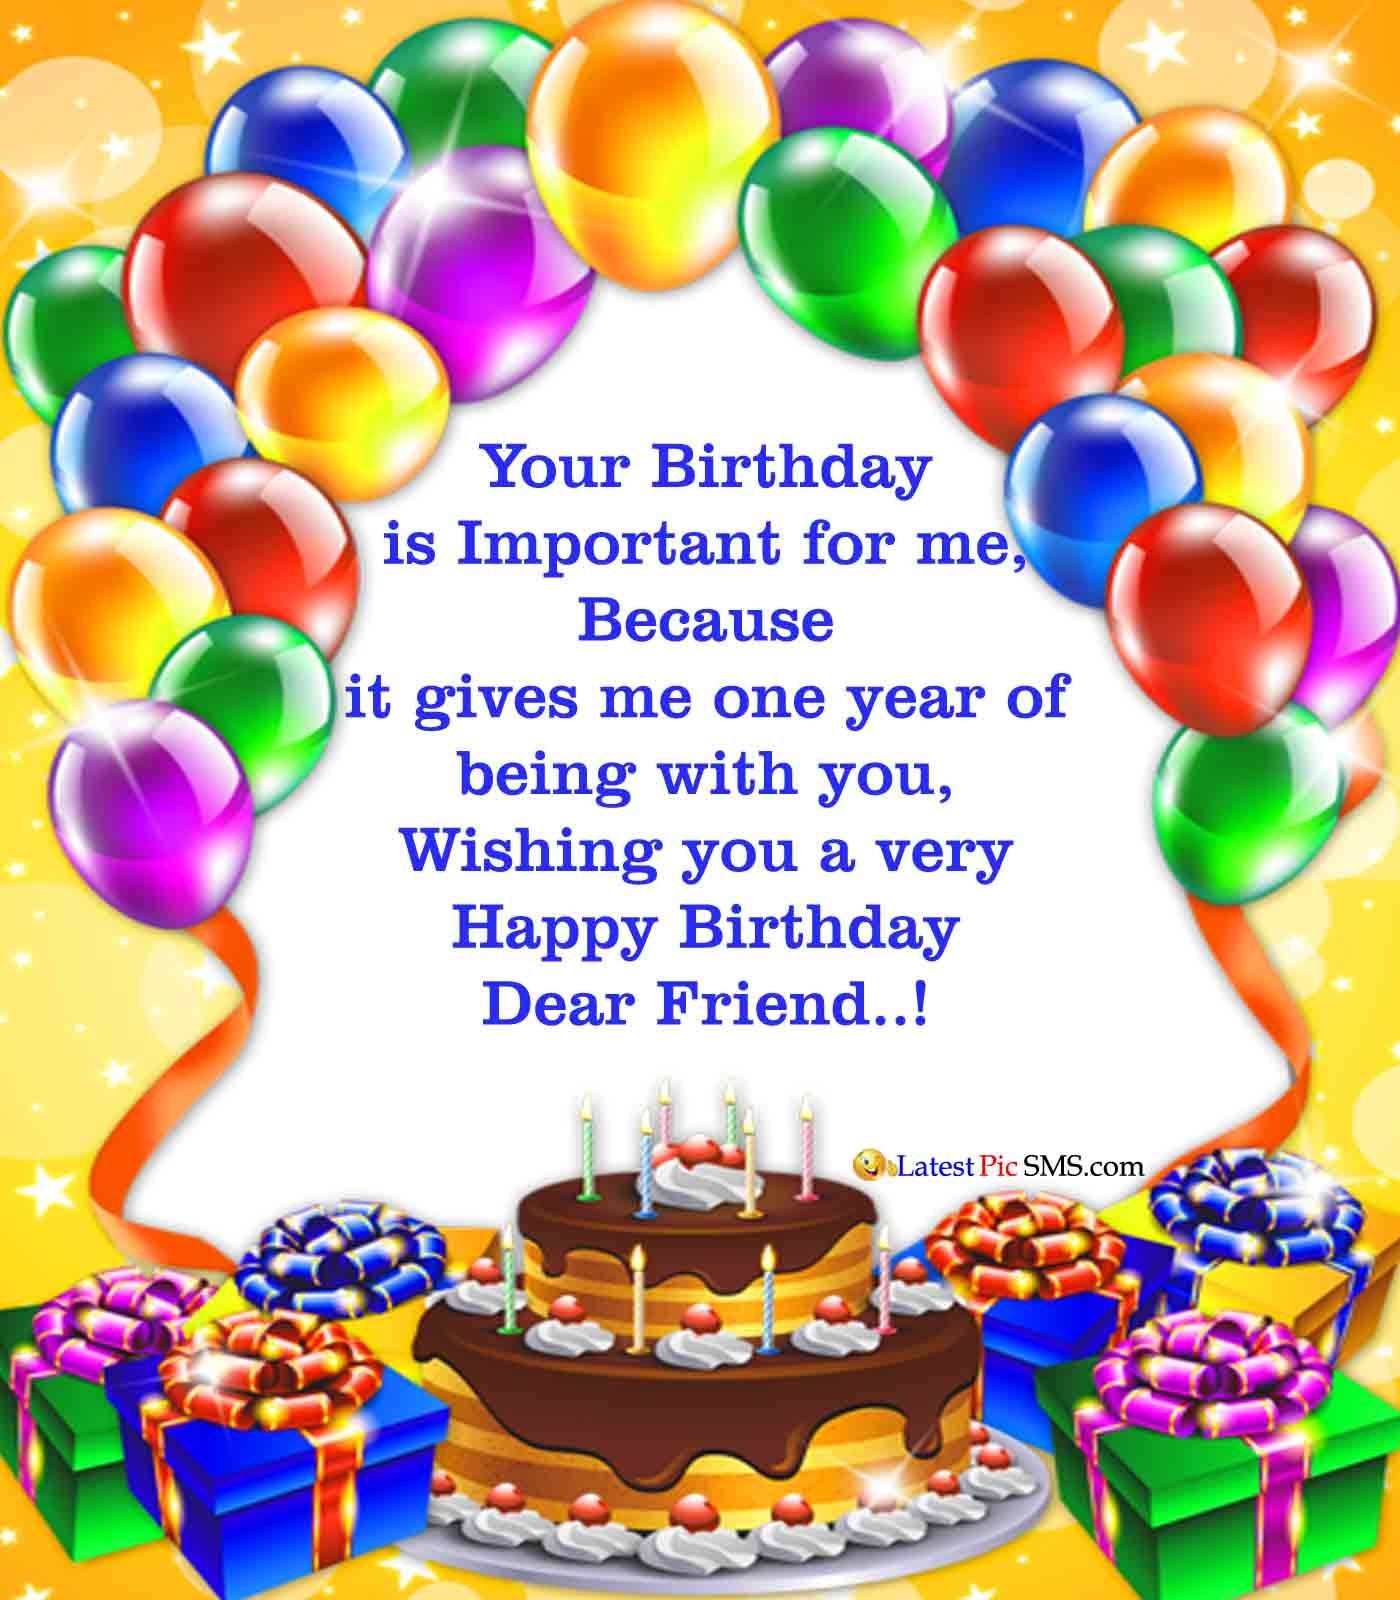 birthday wishes for best friend in hindi shayari Happy